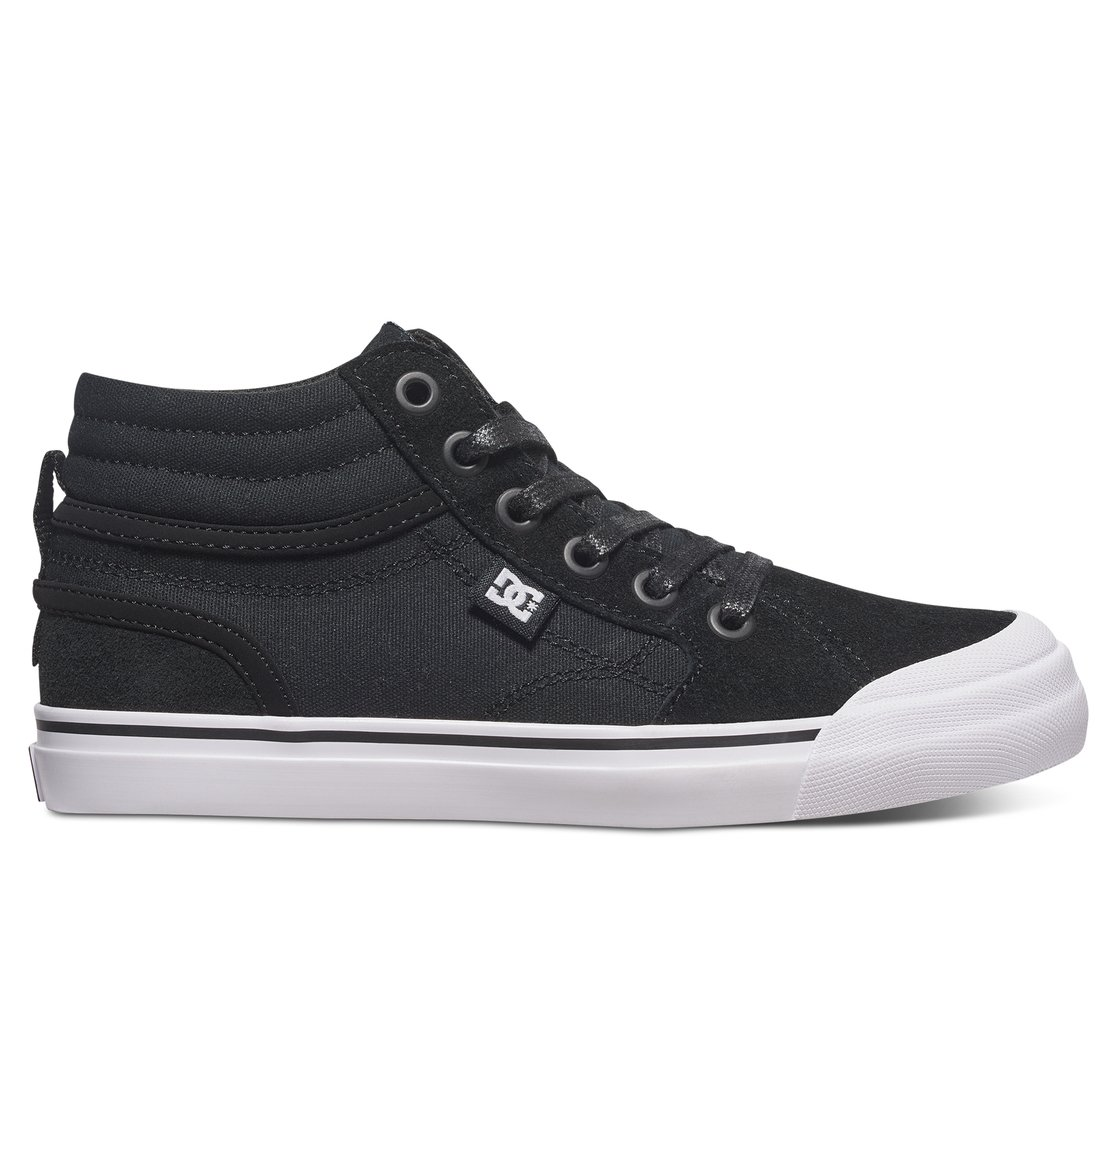 Dc Tonik Shoes Adbs Uk